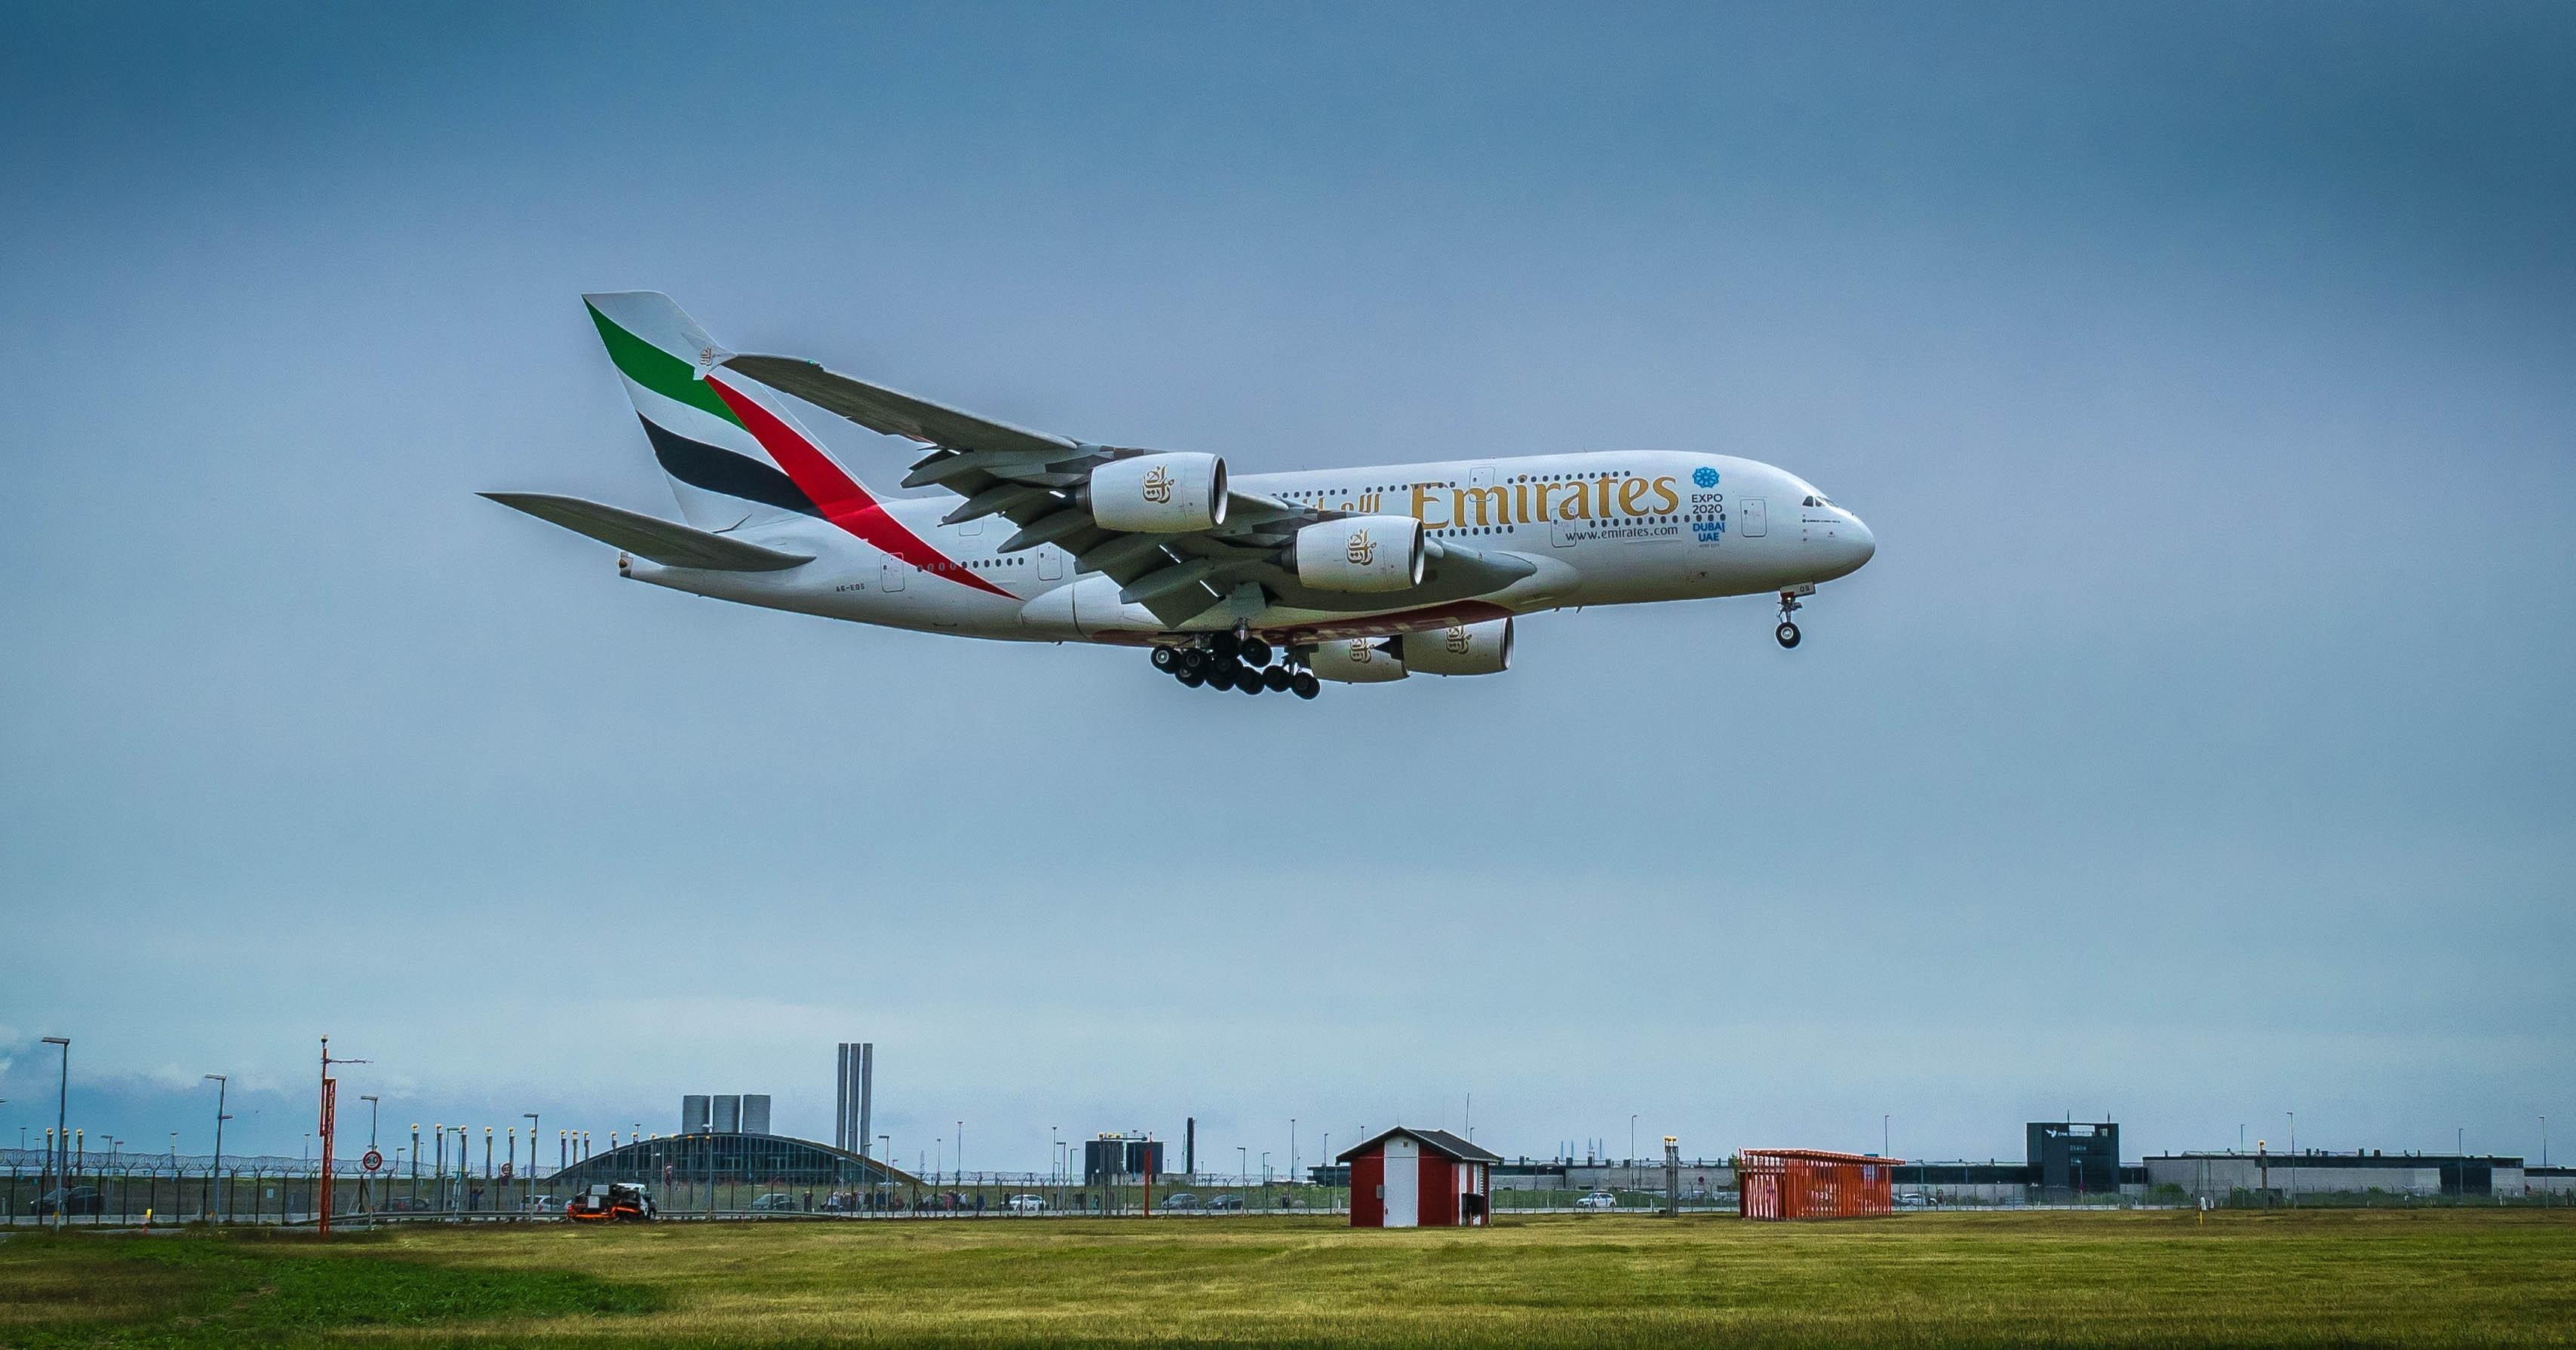 1360x768 wallpaper fly emirates airplane Peakpx 3415x1790